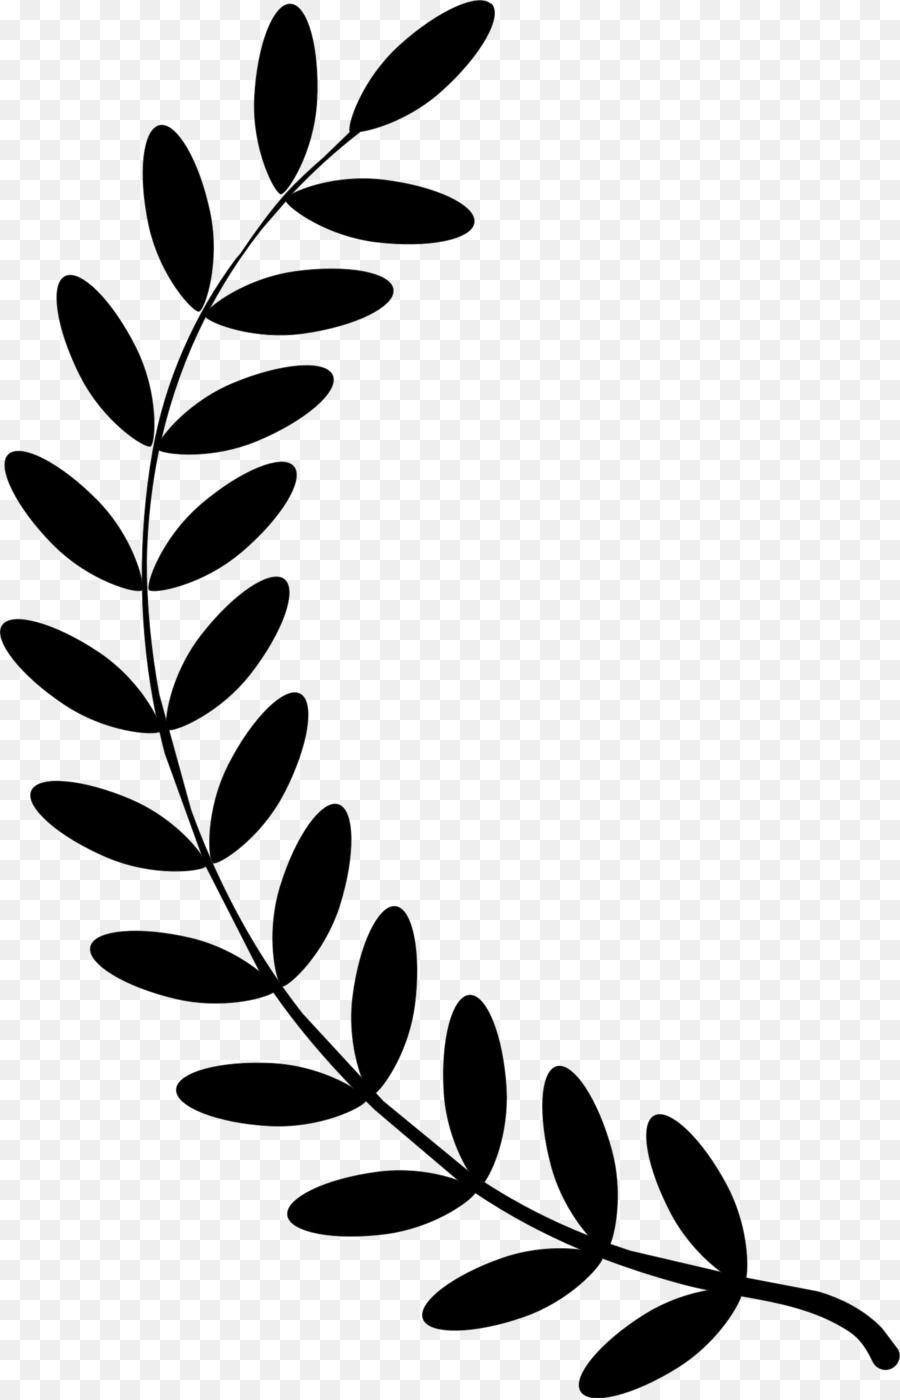 Black And White Flower Unlimited Download Cleanpng Com Wreath Clip Art Laurel Wreath Cricut Crafts